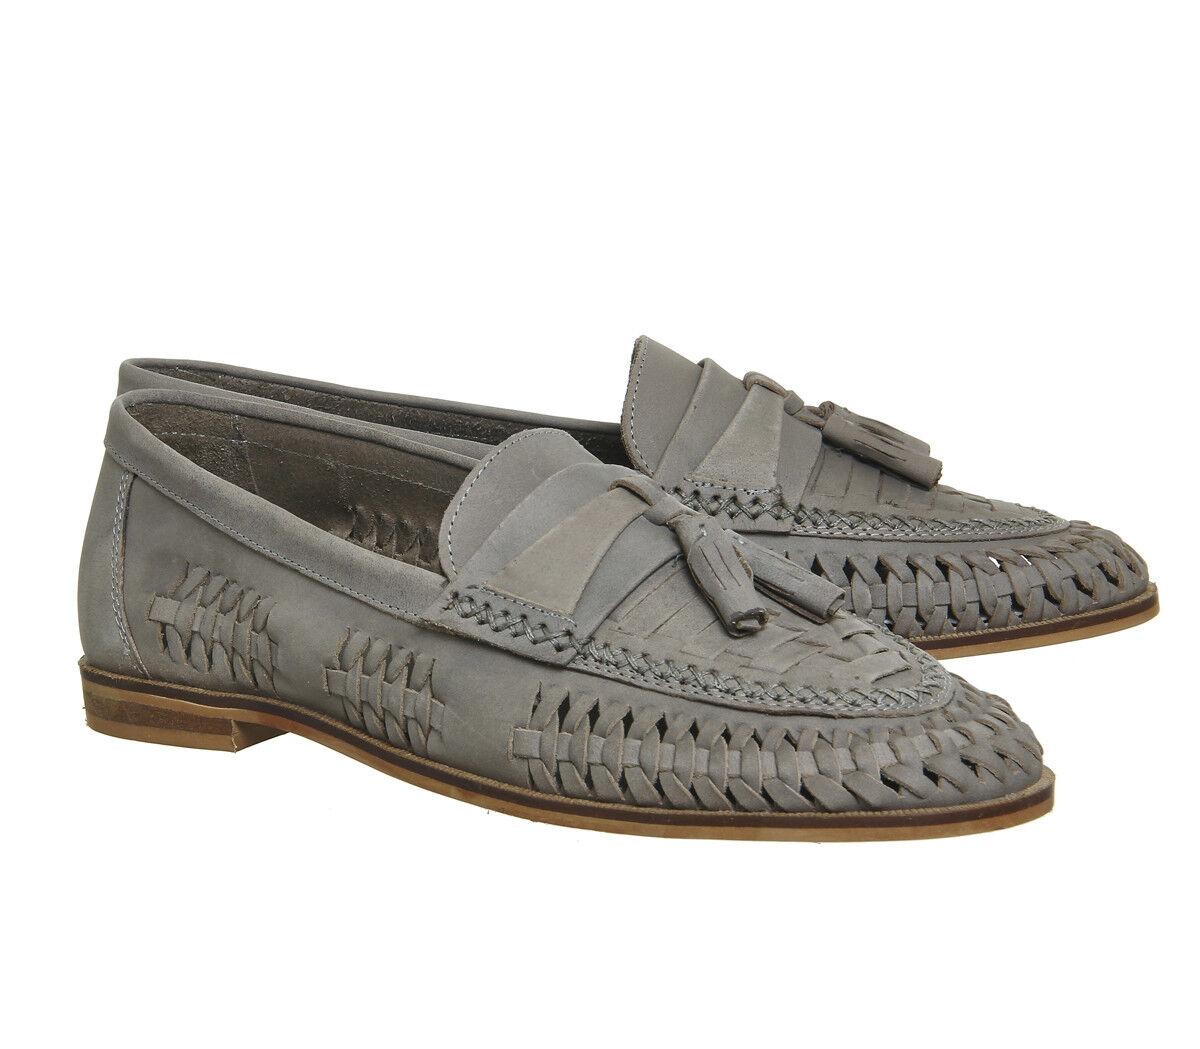 Office Finsbury Woven Tassle Light Grey Leather Men's shoes Size UK 6